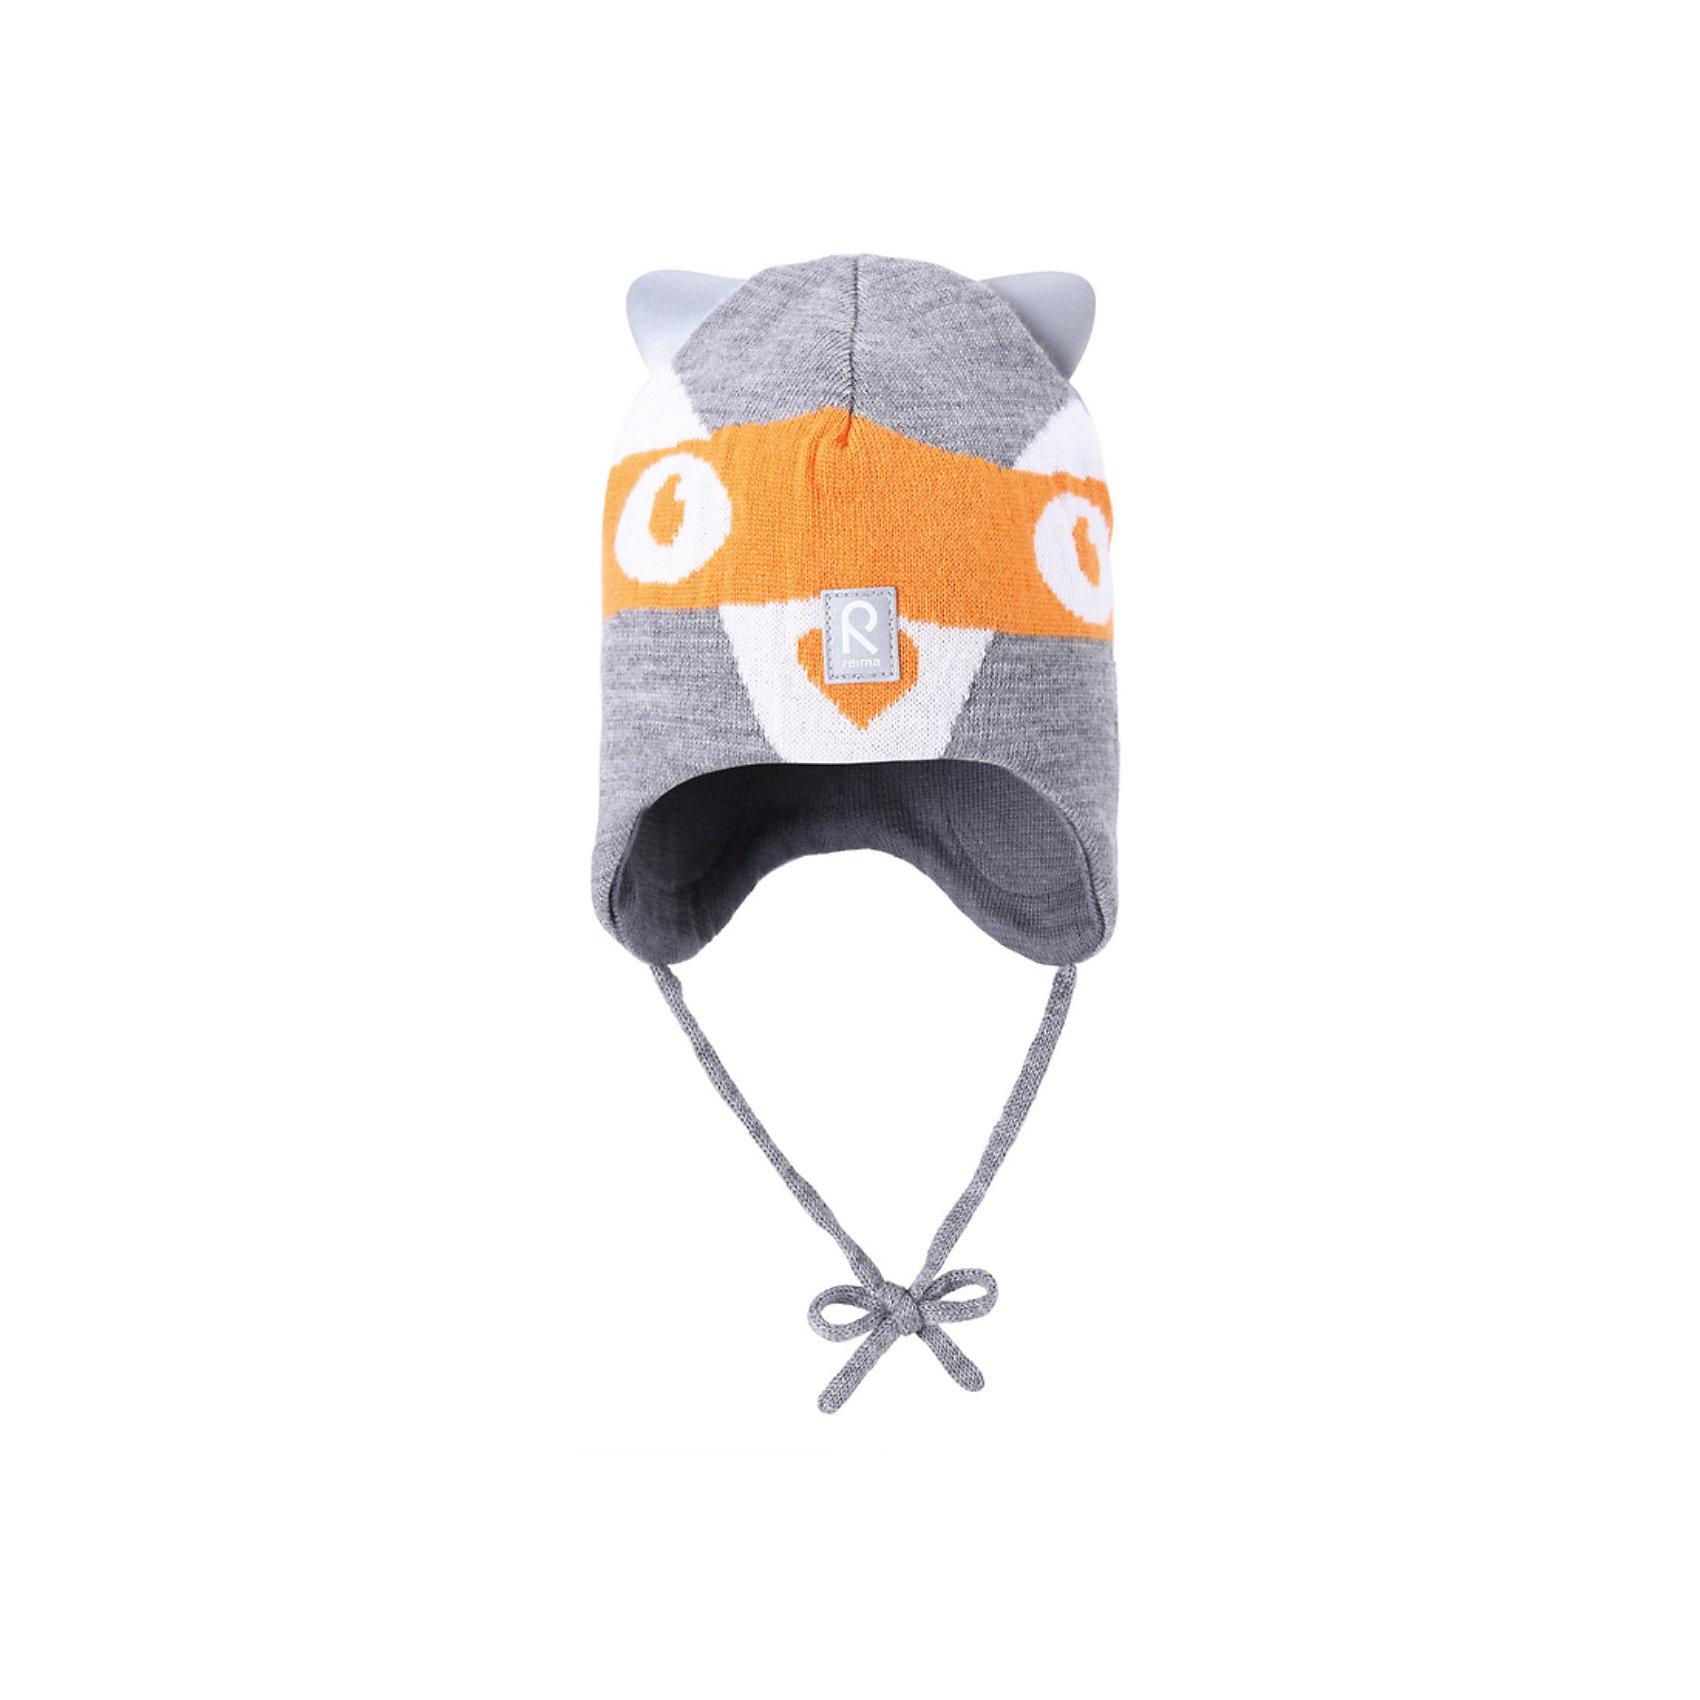 Reima Шапка для мальчика Reima reima повязка на голову tails для мальчика reima